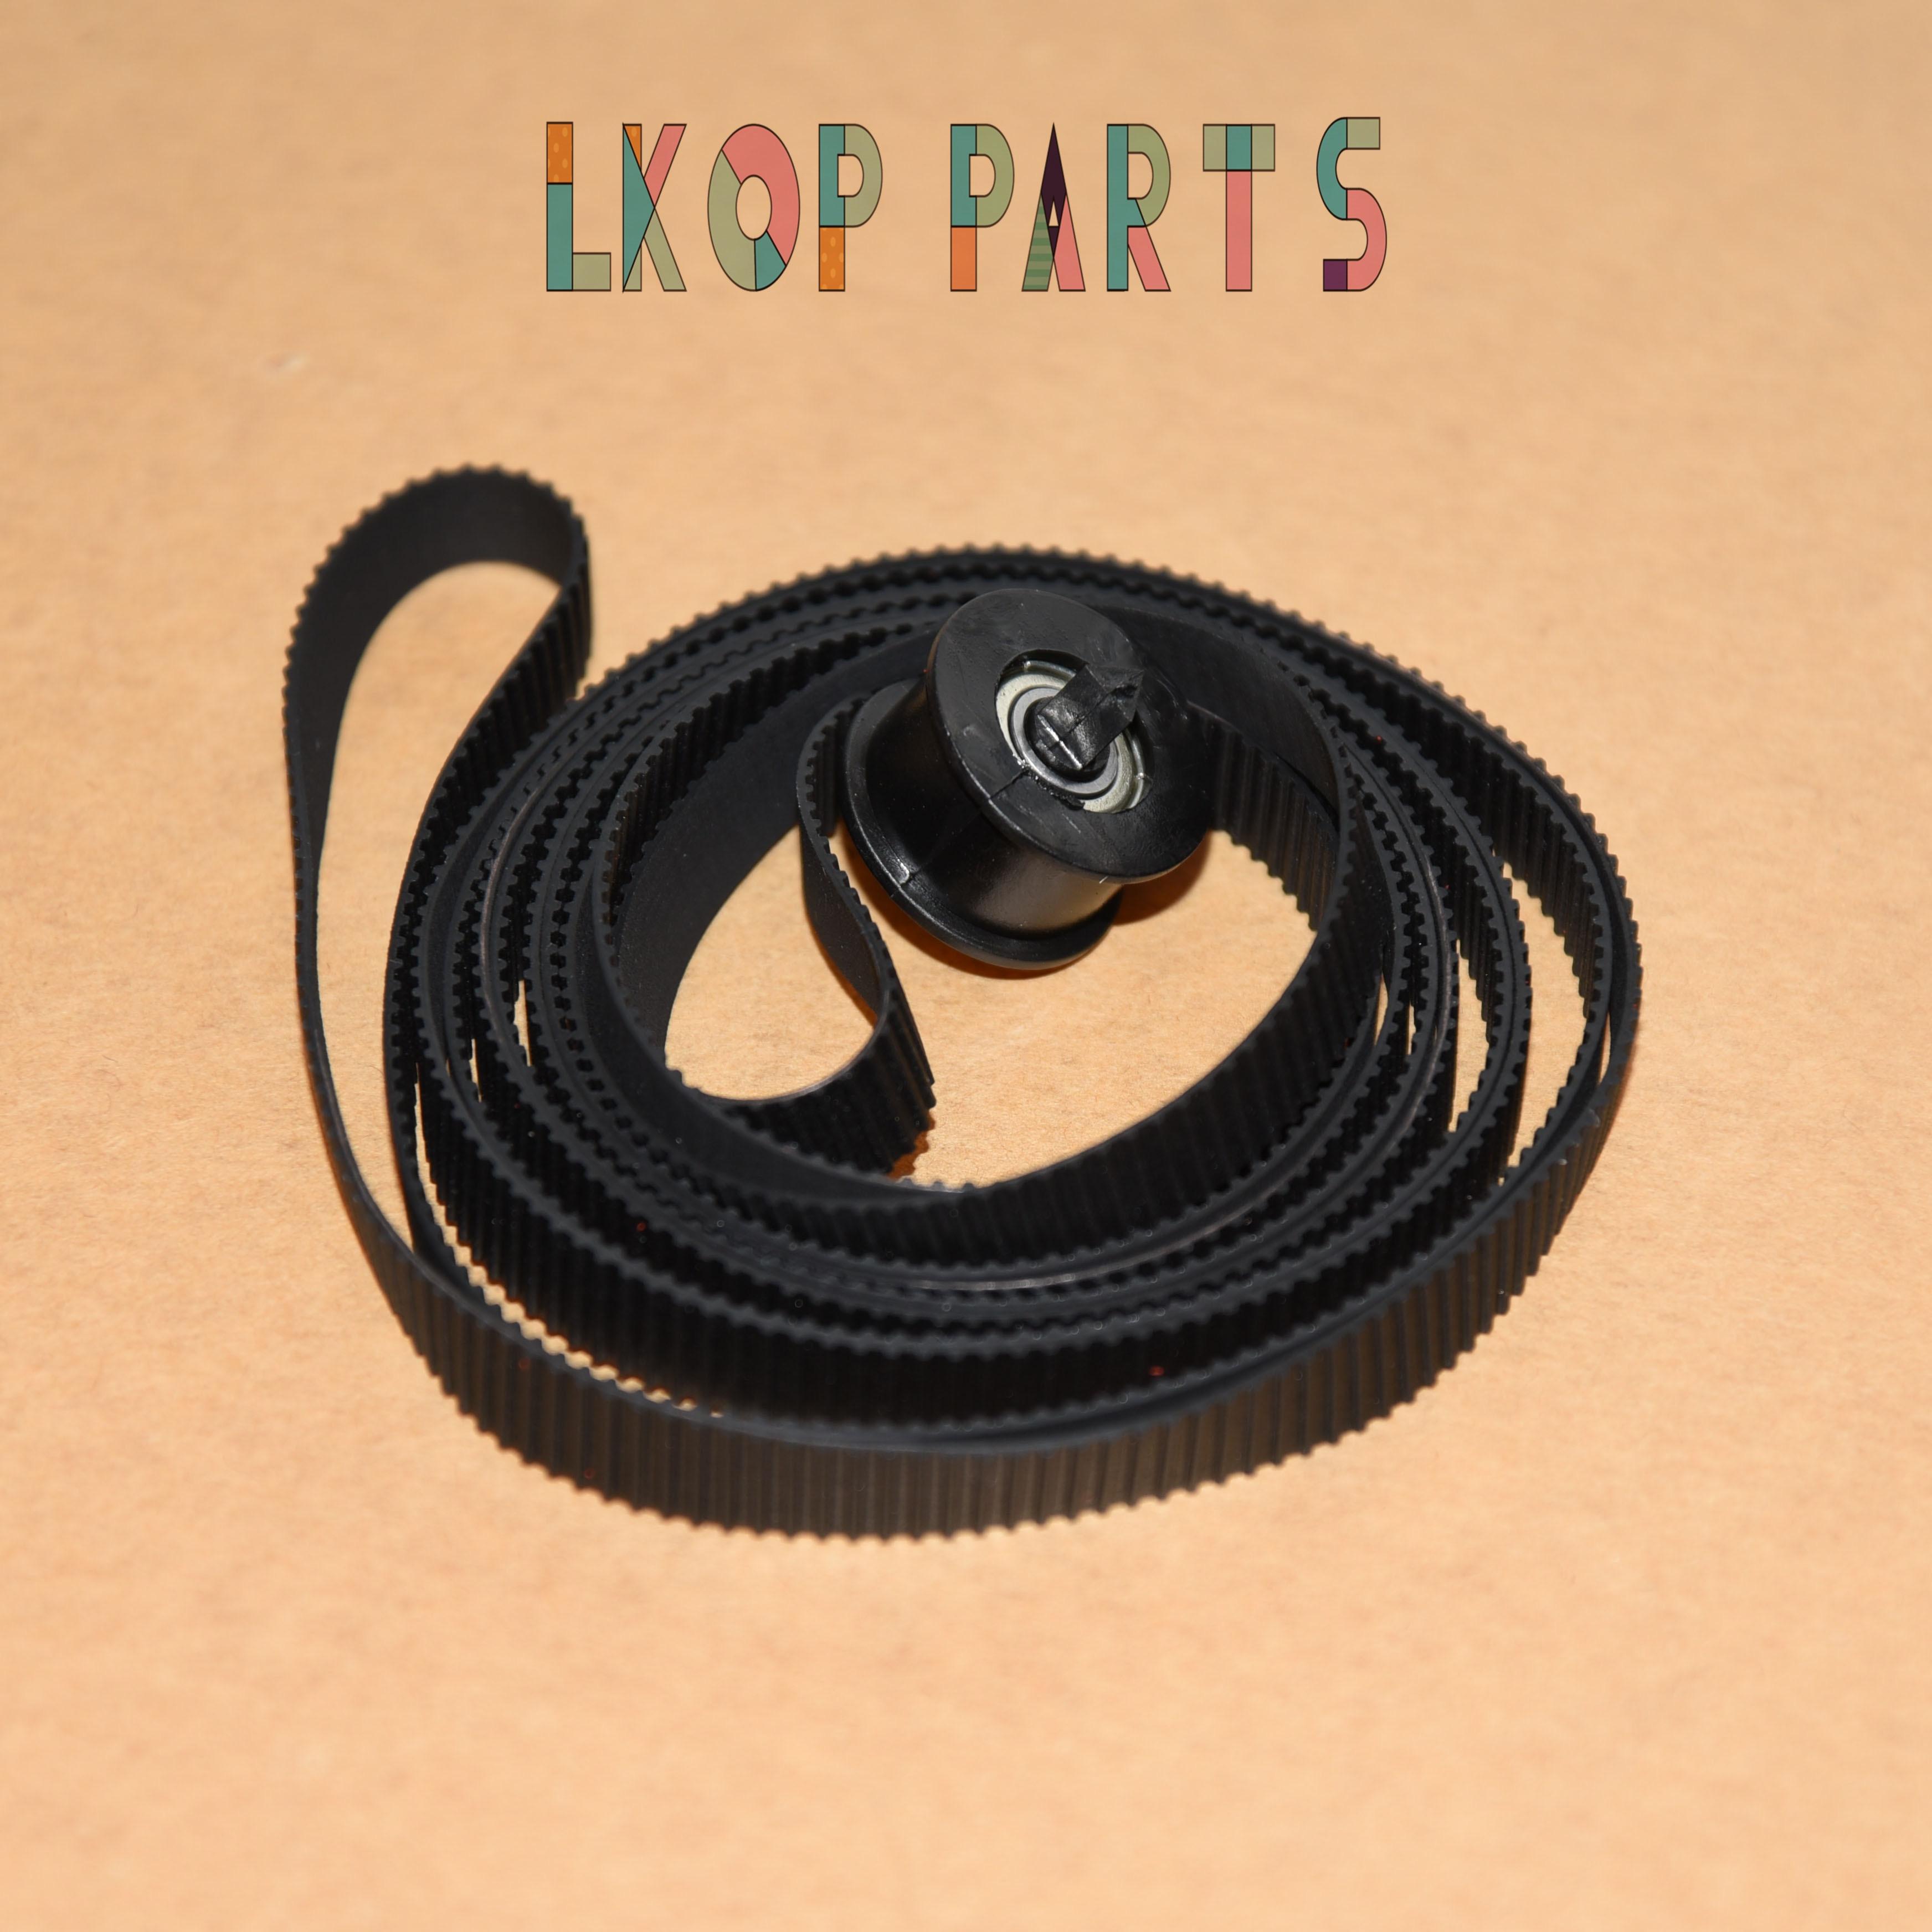 10Pcs C7770-60014 42 polegada C7769-60182 24 polegada DesignJet Plotter Carriage Belt para HP500 500PS 800 800PS 510 510PS 815 CC800PS 820